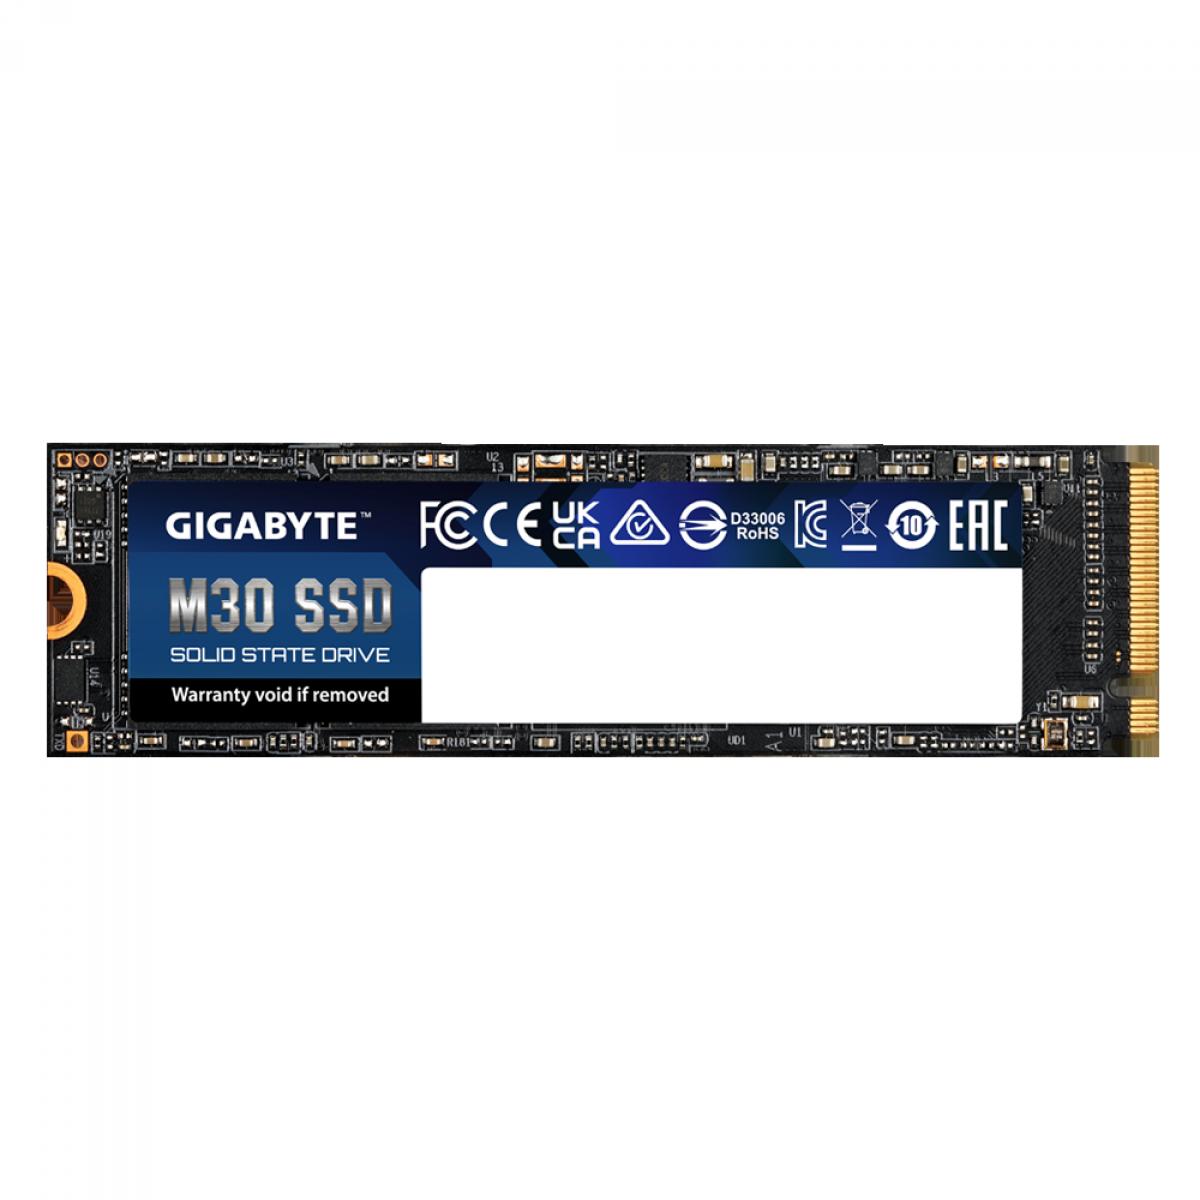 SSD Gigabyte M30, 512GB, M.2 2280, NVMe, Leitura 3500MBs e Gravação 2600MBs, GP-GM30512G-G